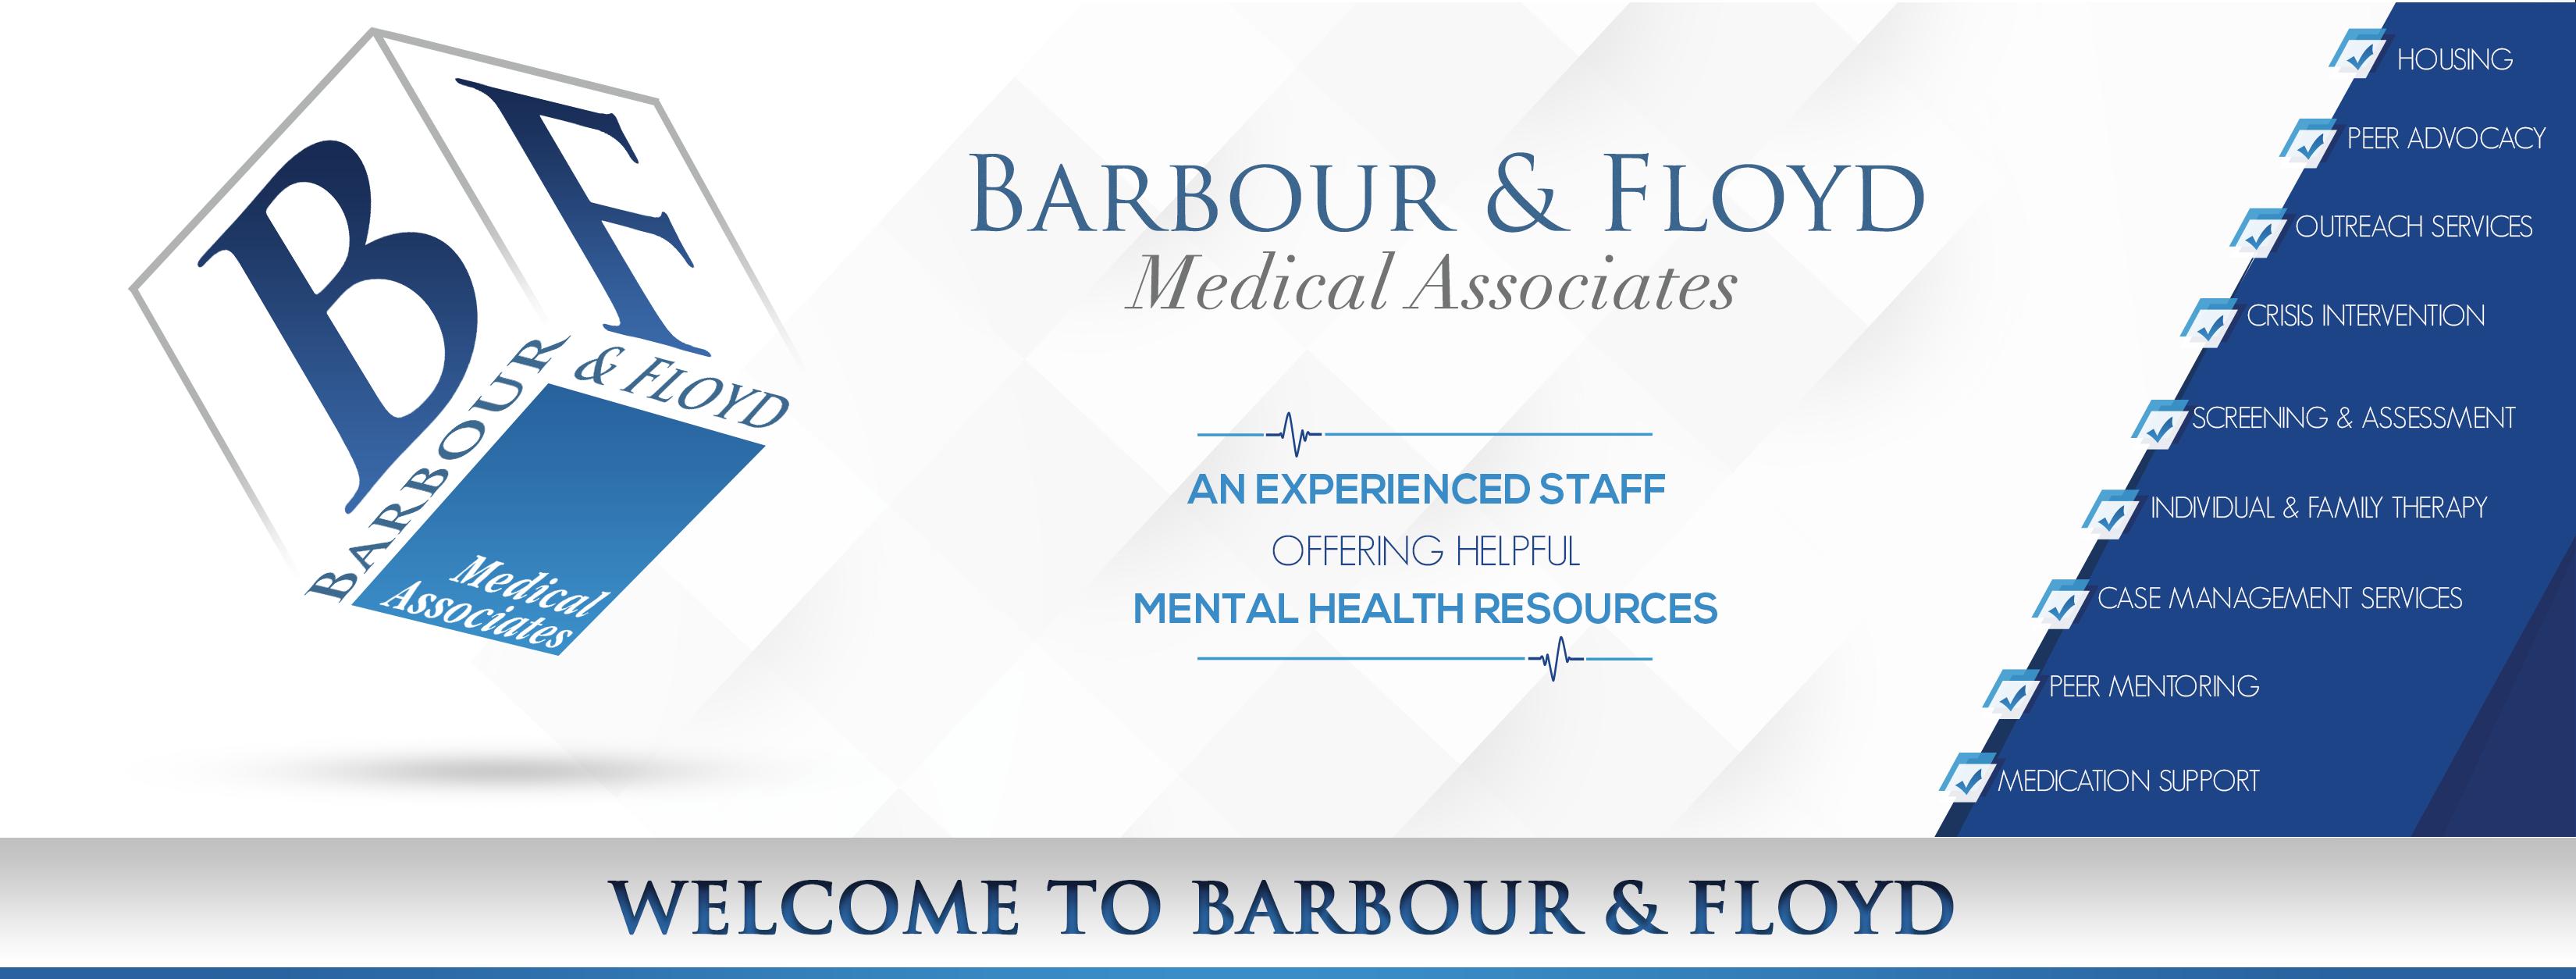 Barbour & Floyd Medical Associates